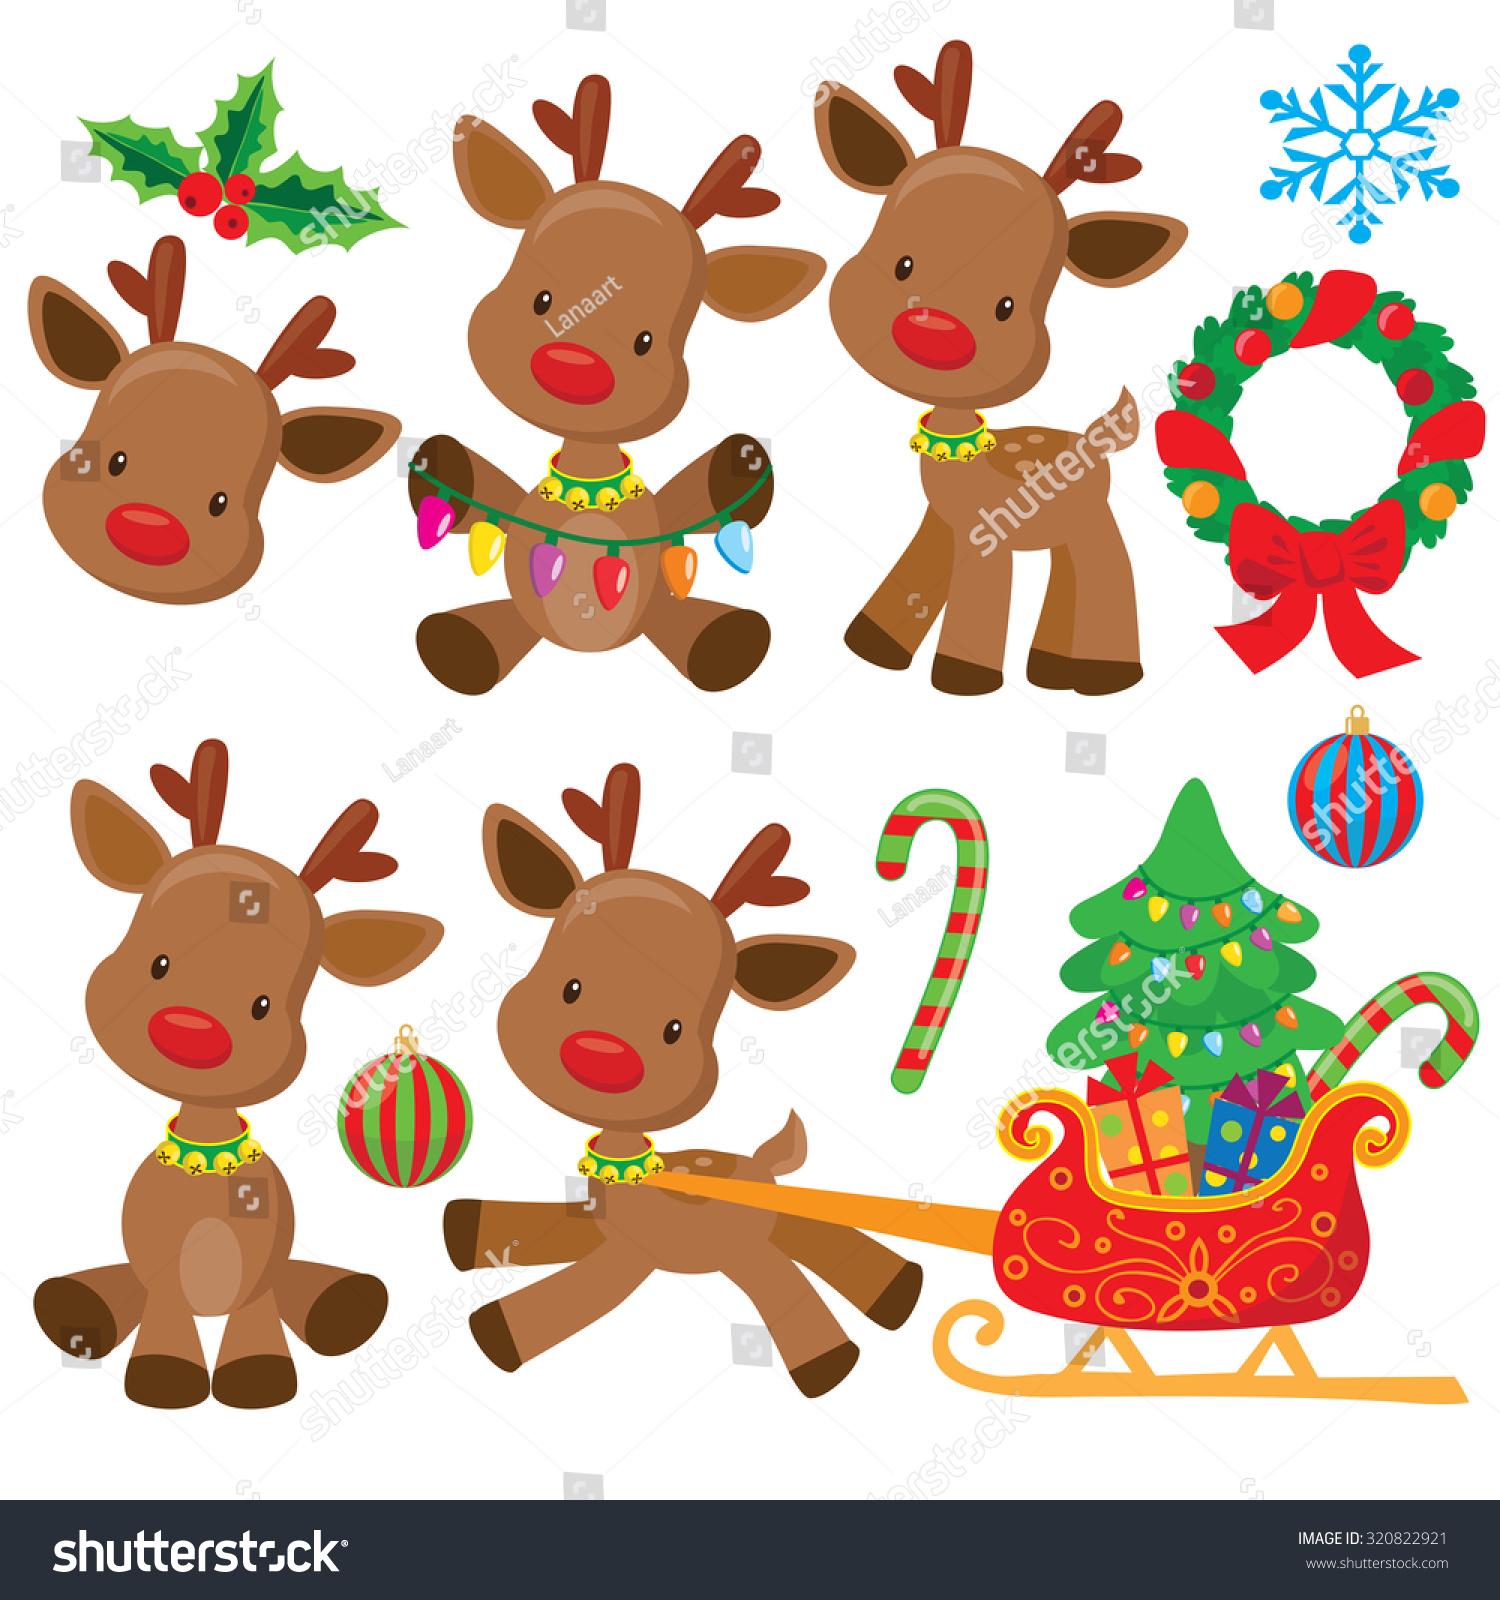 Christmas Reindeer Vector Illustration - 320822921 ...